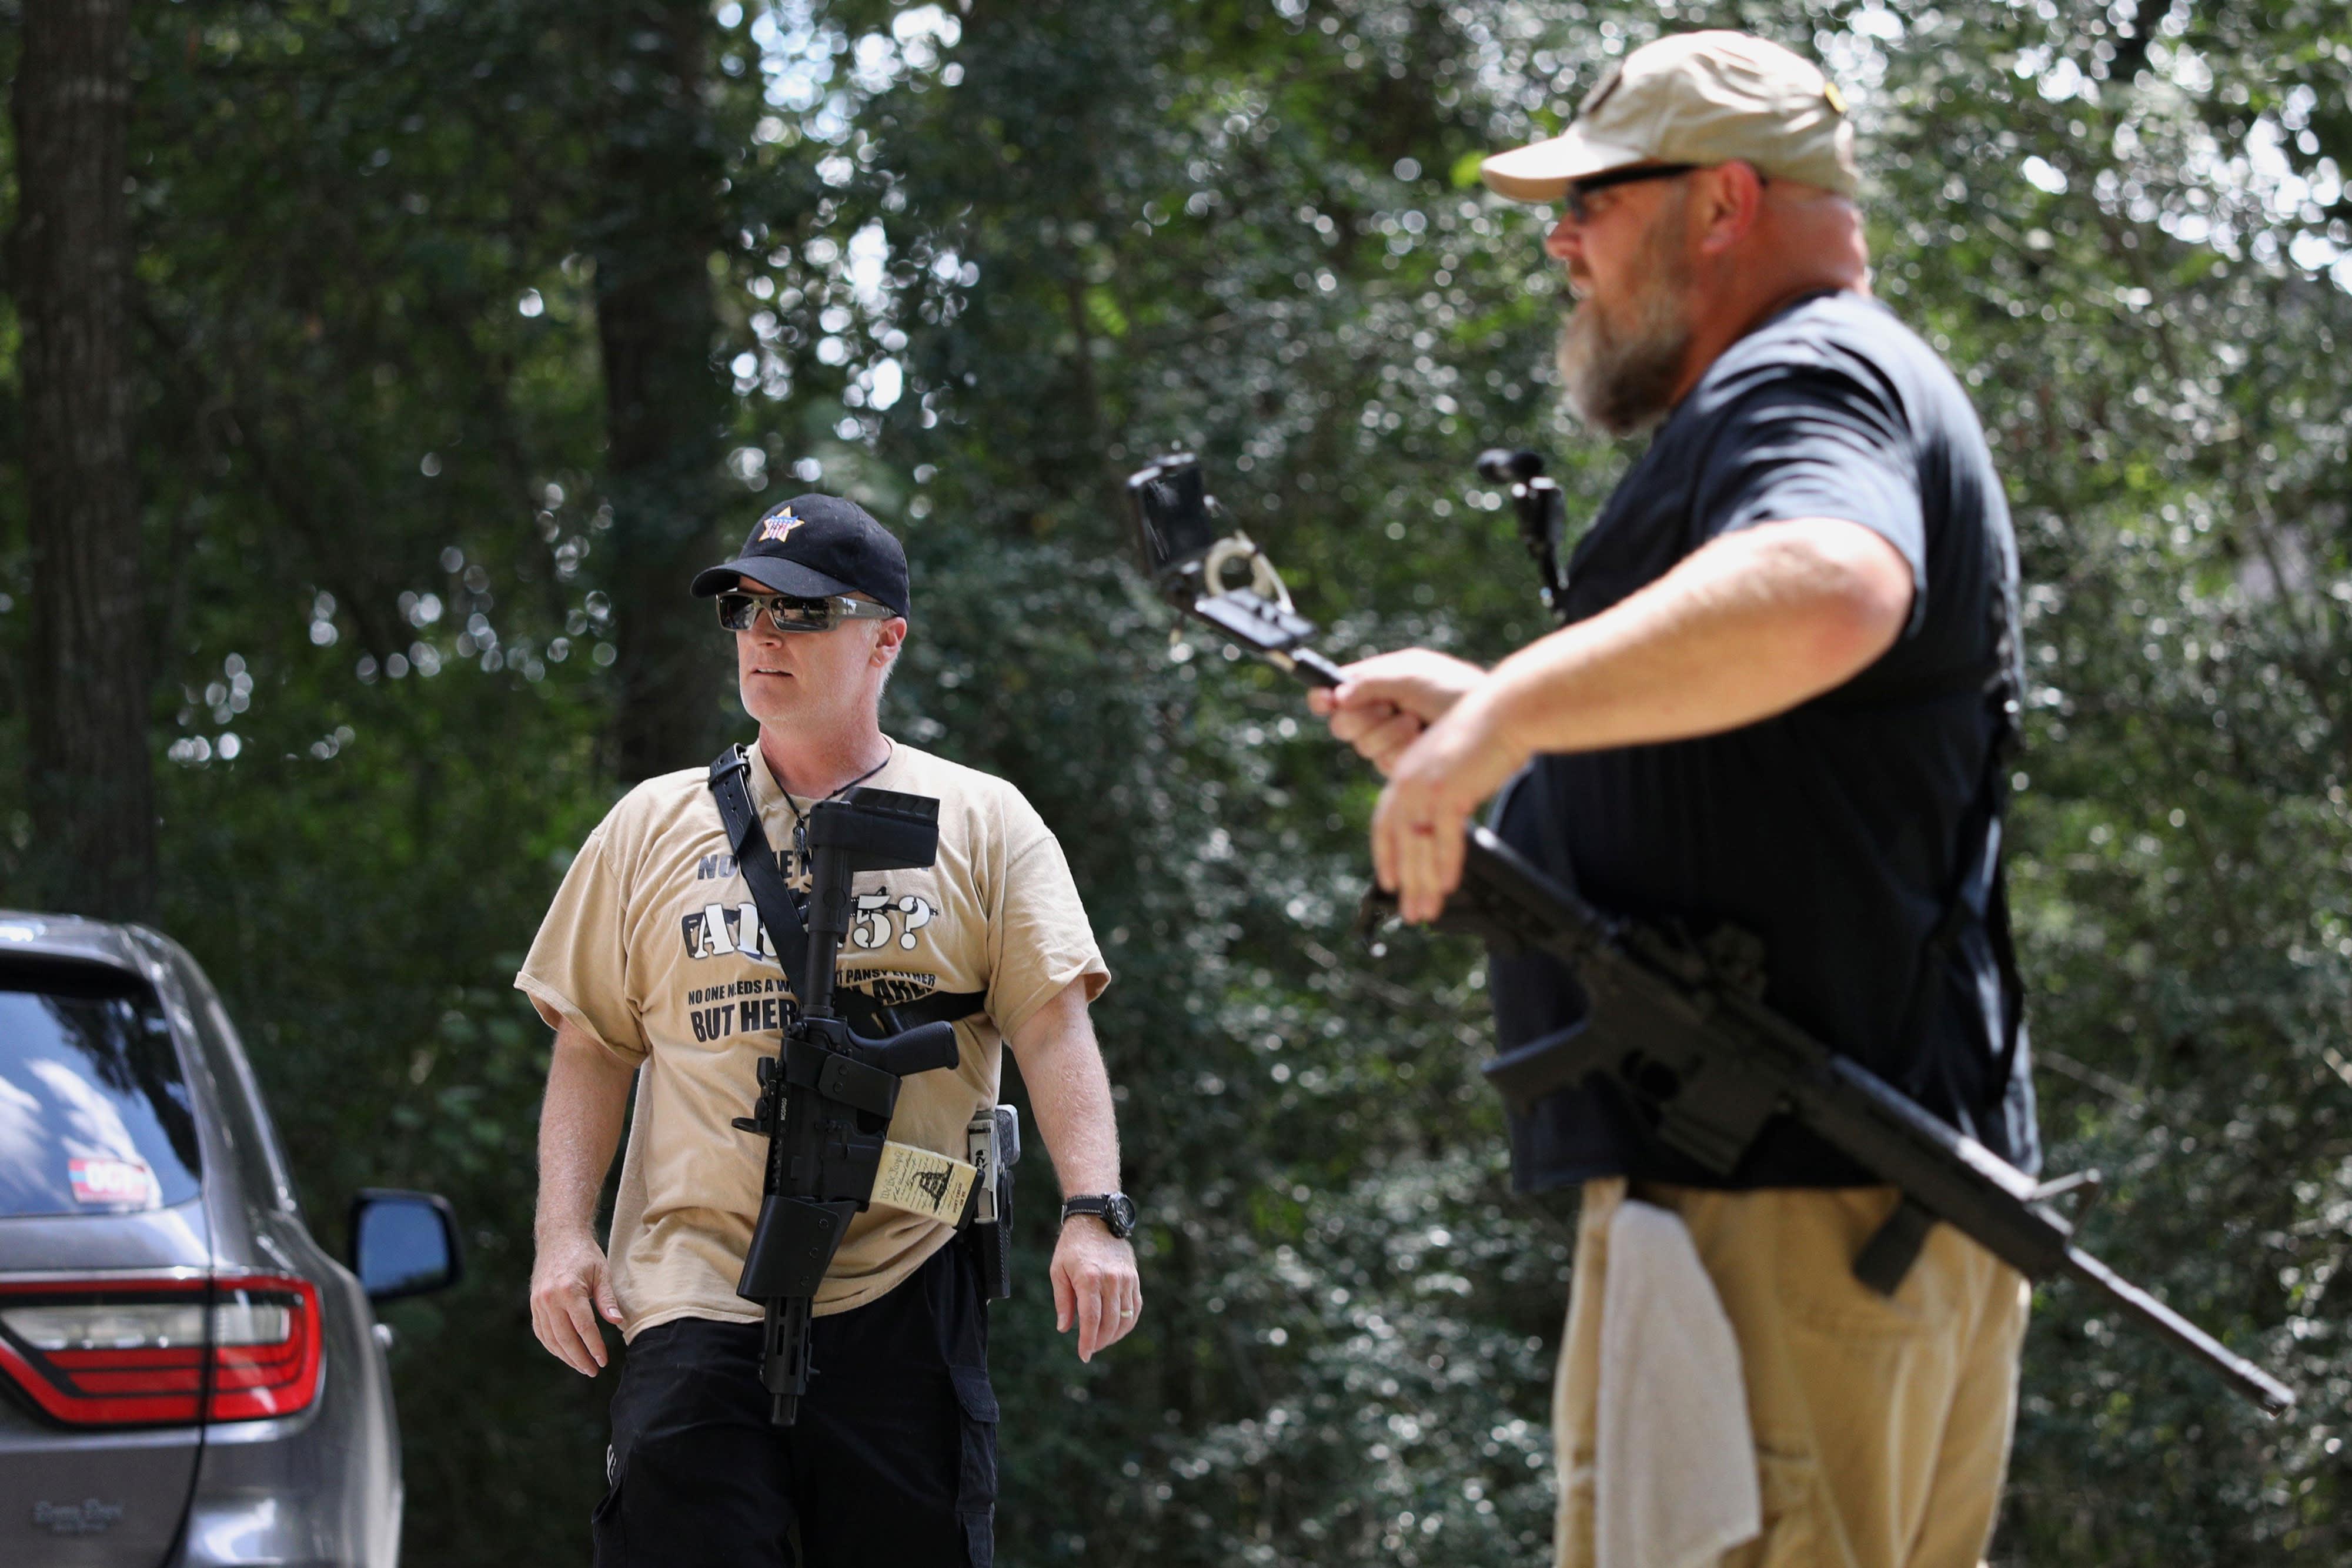 National Rifle Association News